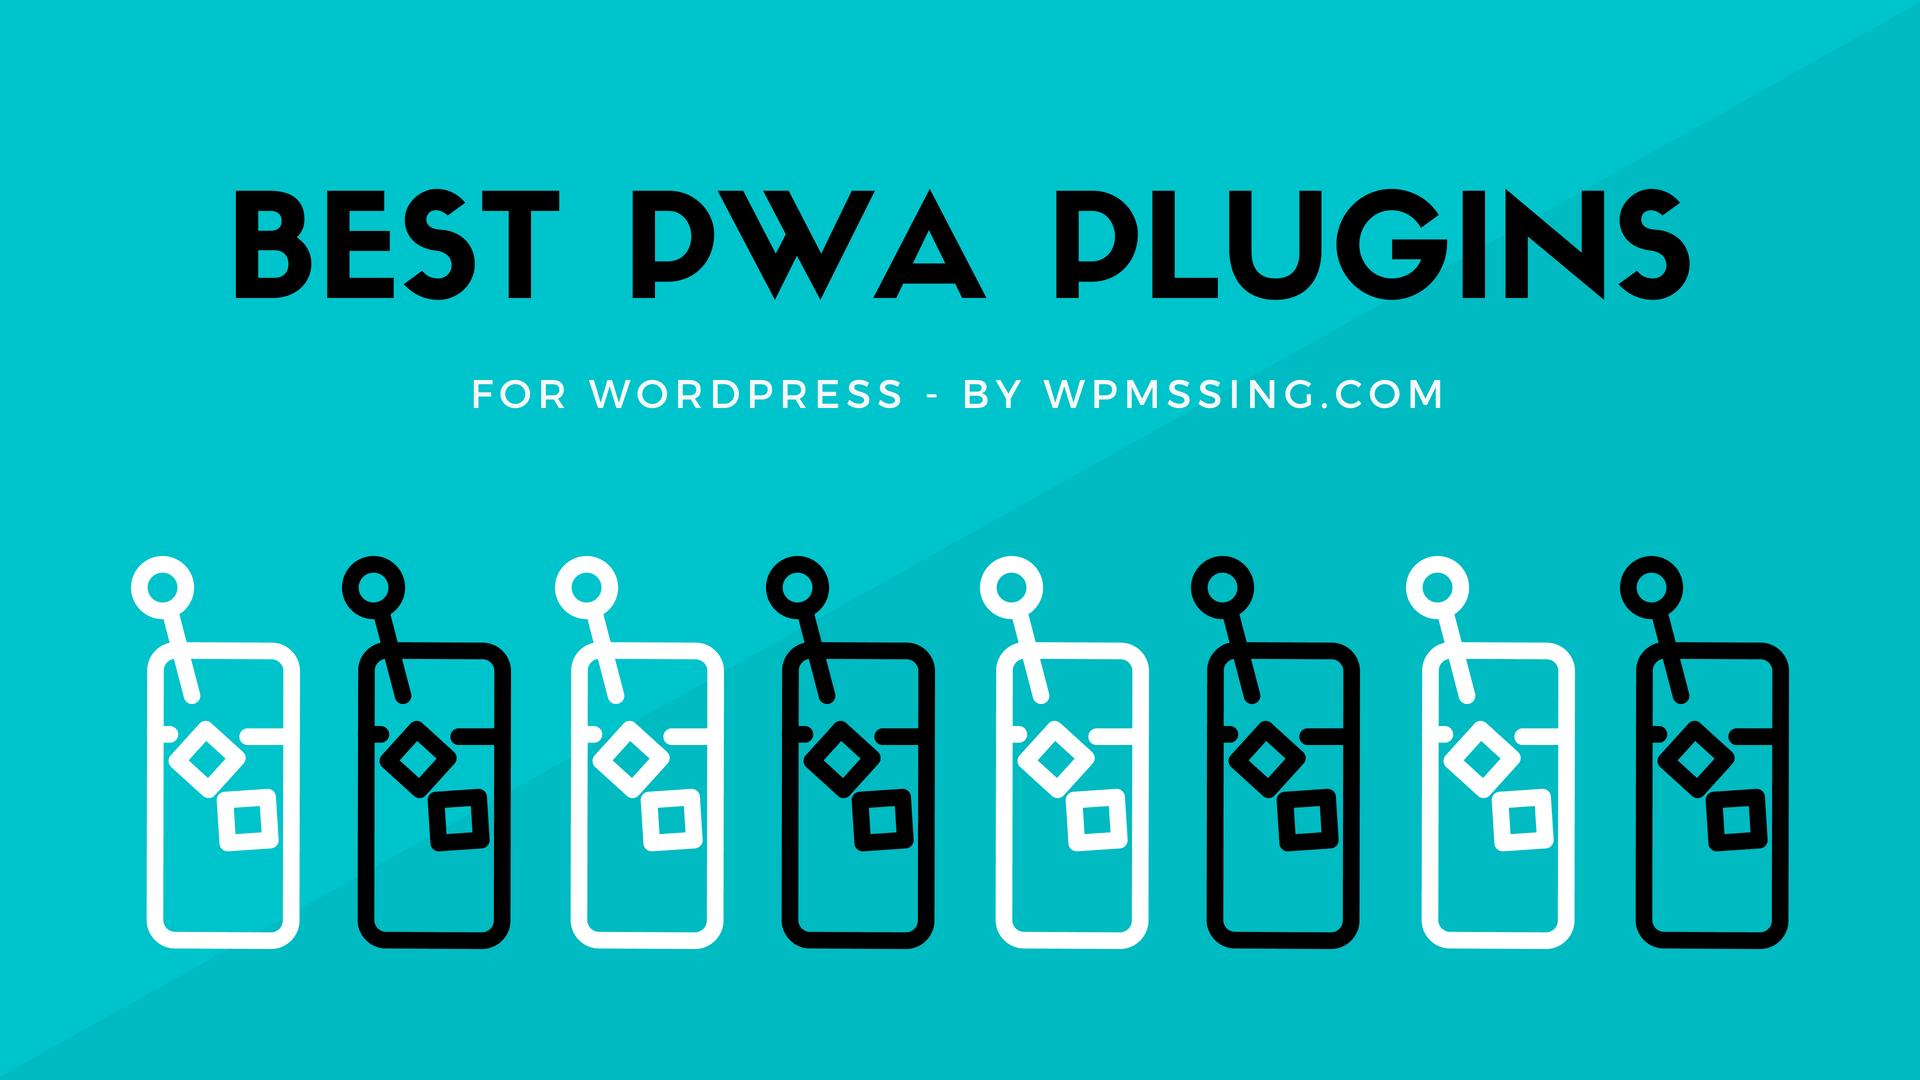 5 Best Progressive Web App Plugins For WordPress (2019 Update) | WP